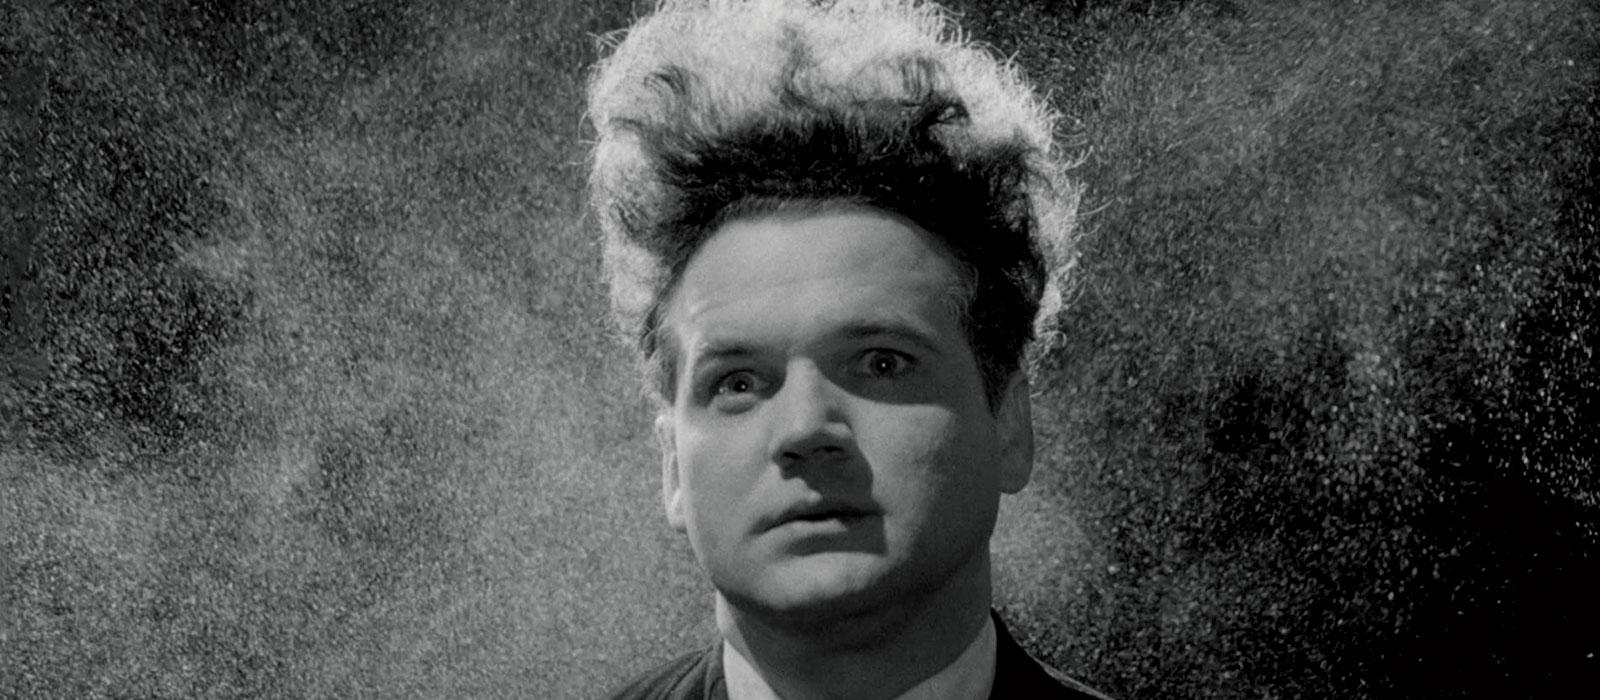 「Eraserhead」の画像検索結果